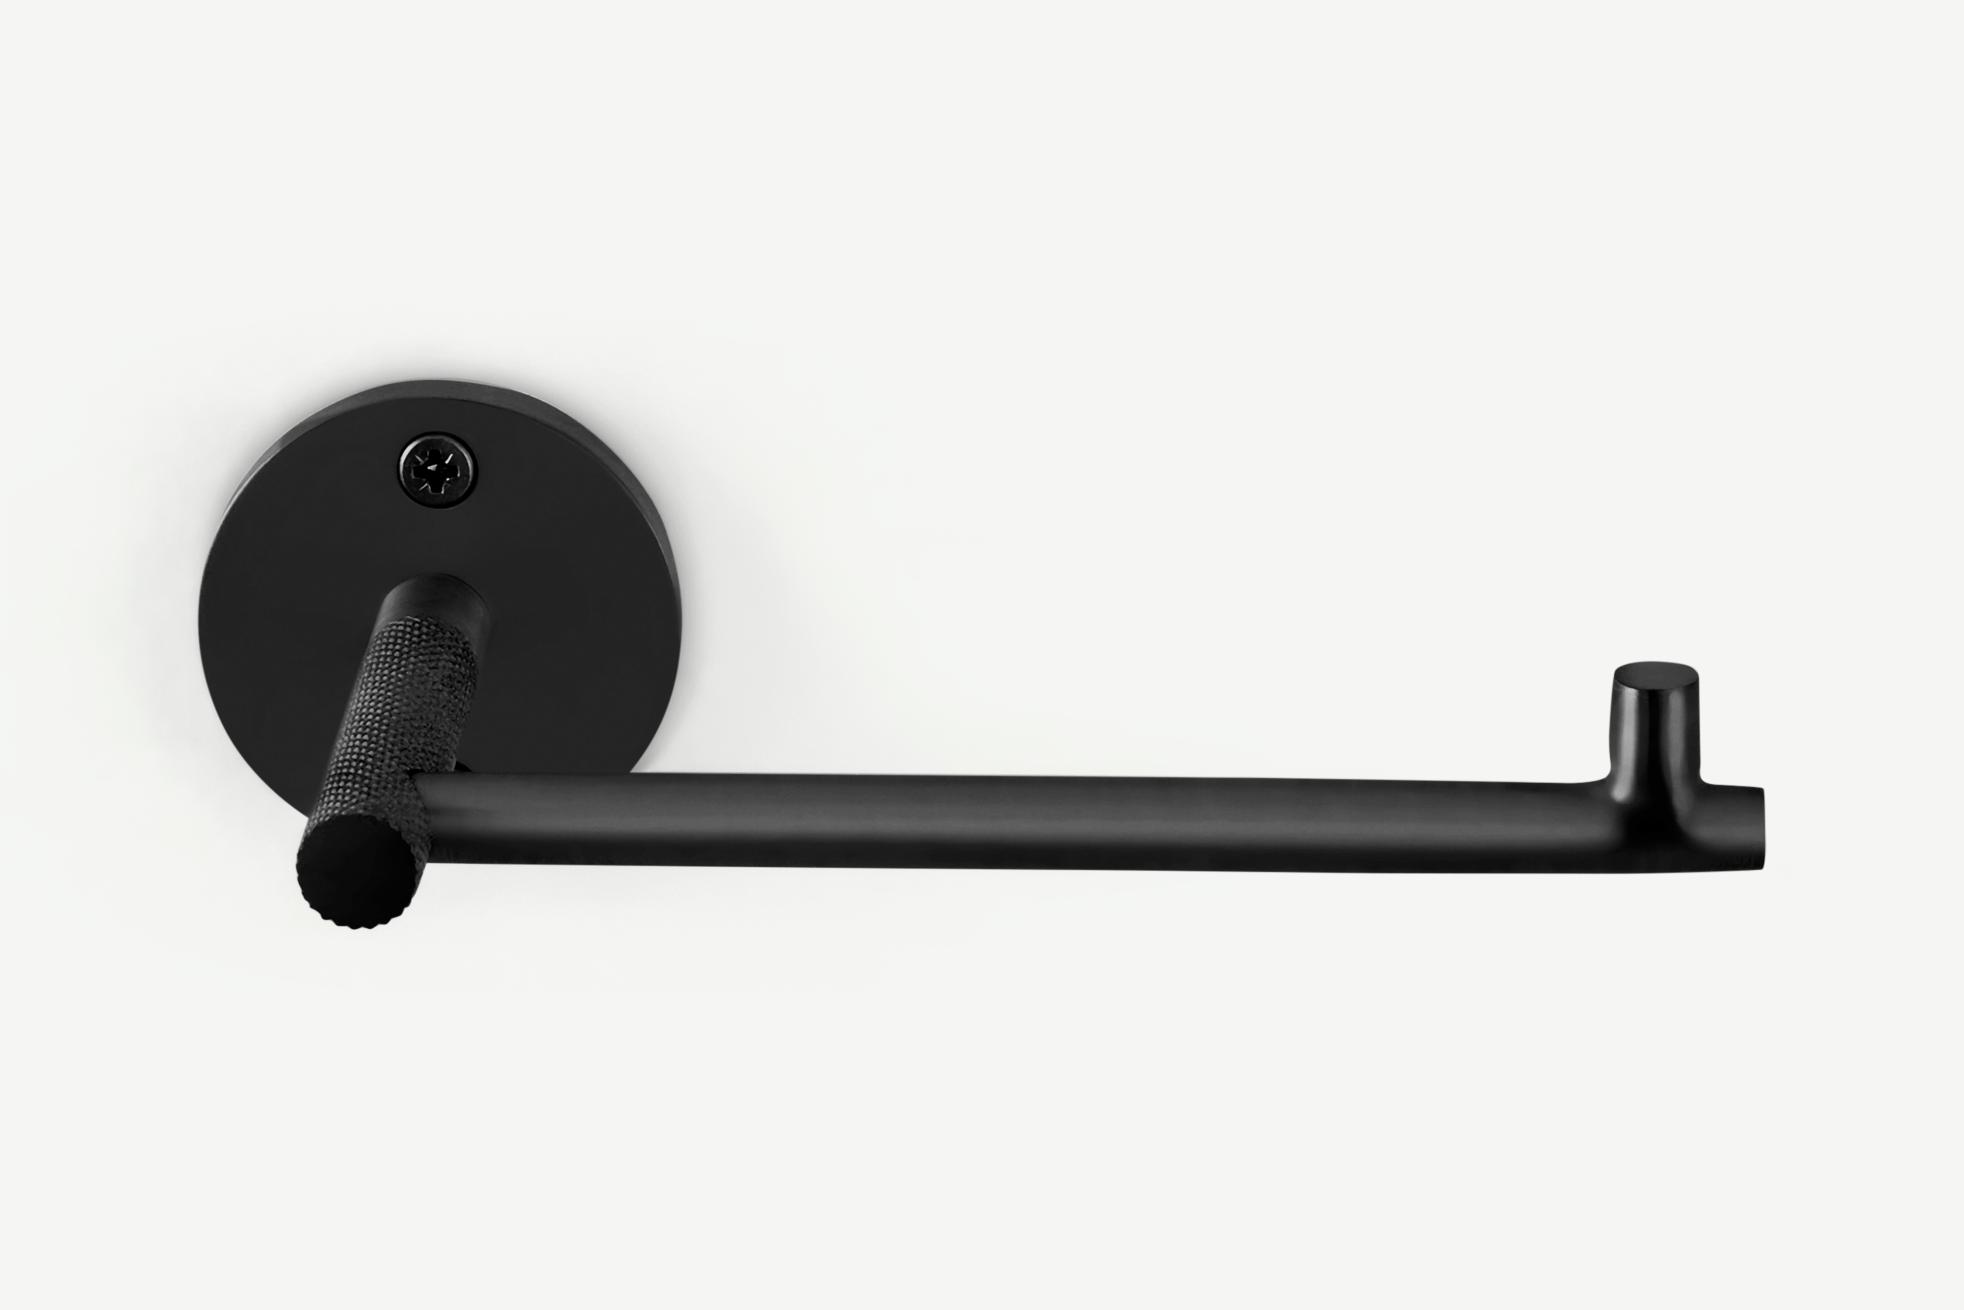 https://www.made.com/en/support-for-jovi-niquel-black-paper-roll